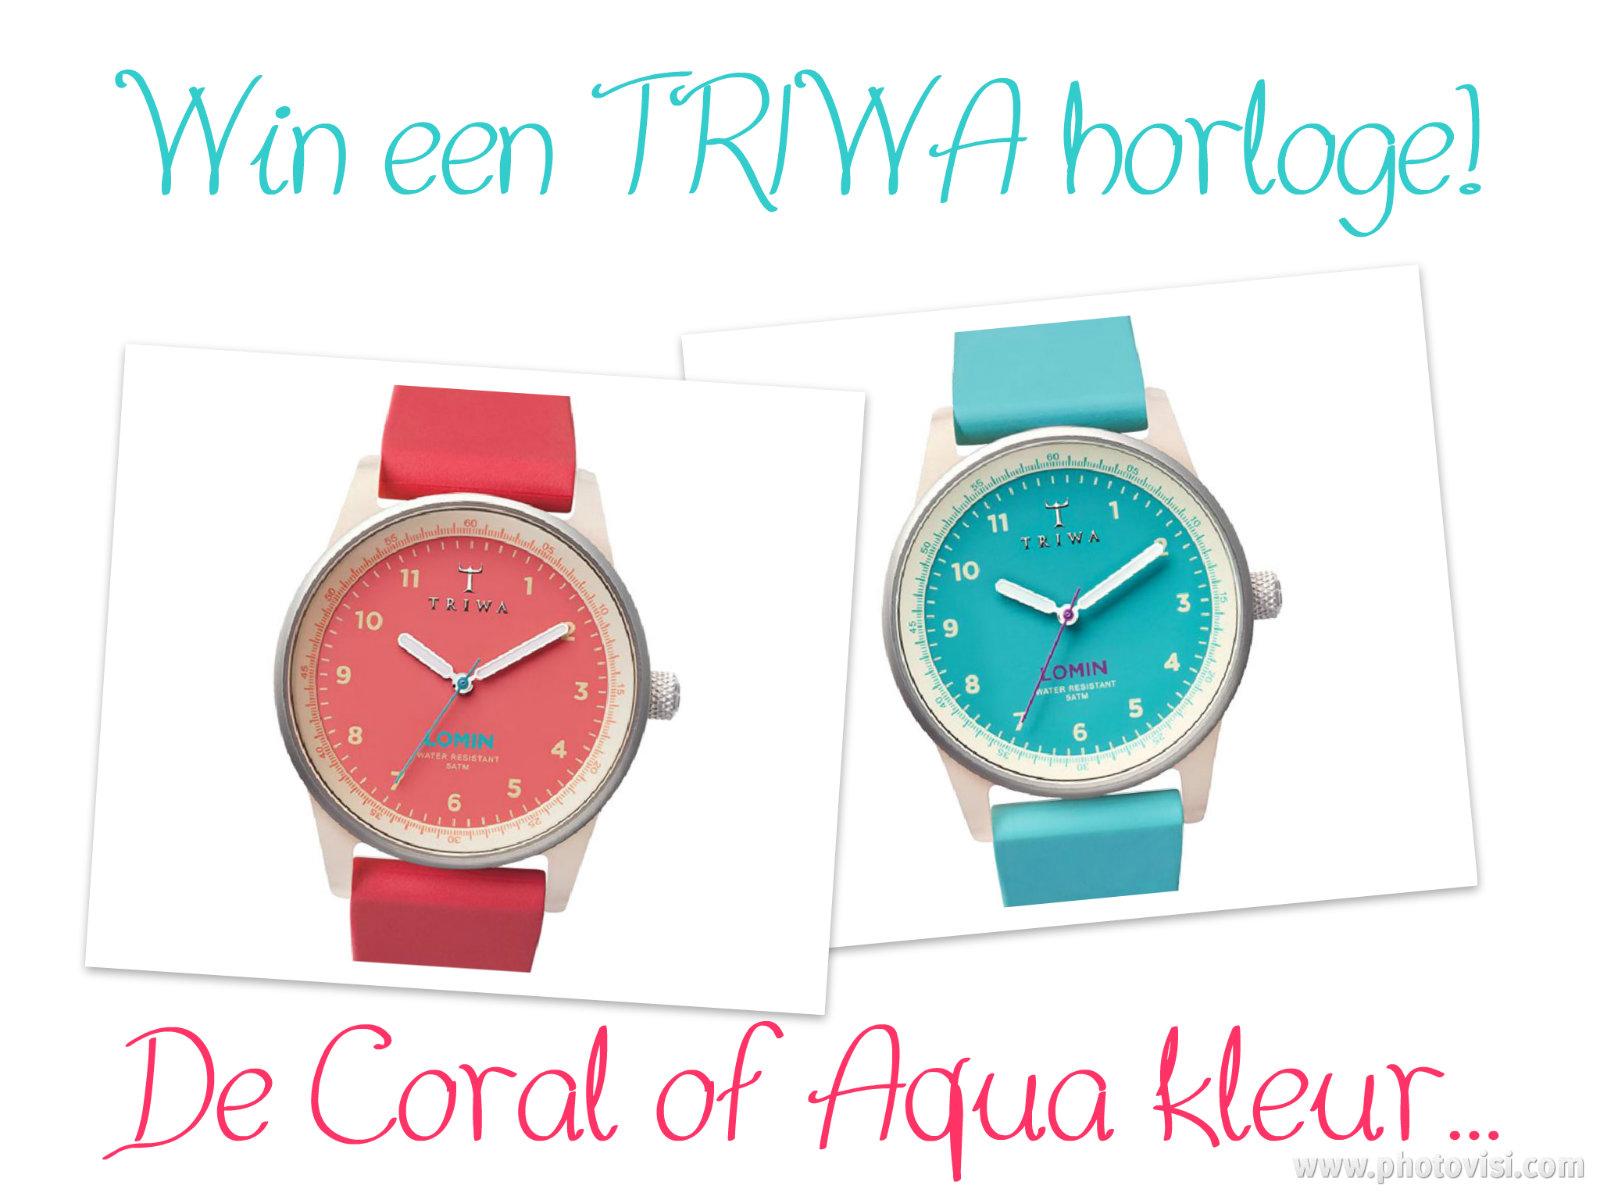 Winactie TRIWA horloges Coral en Aqua